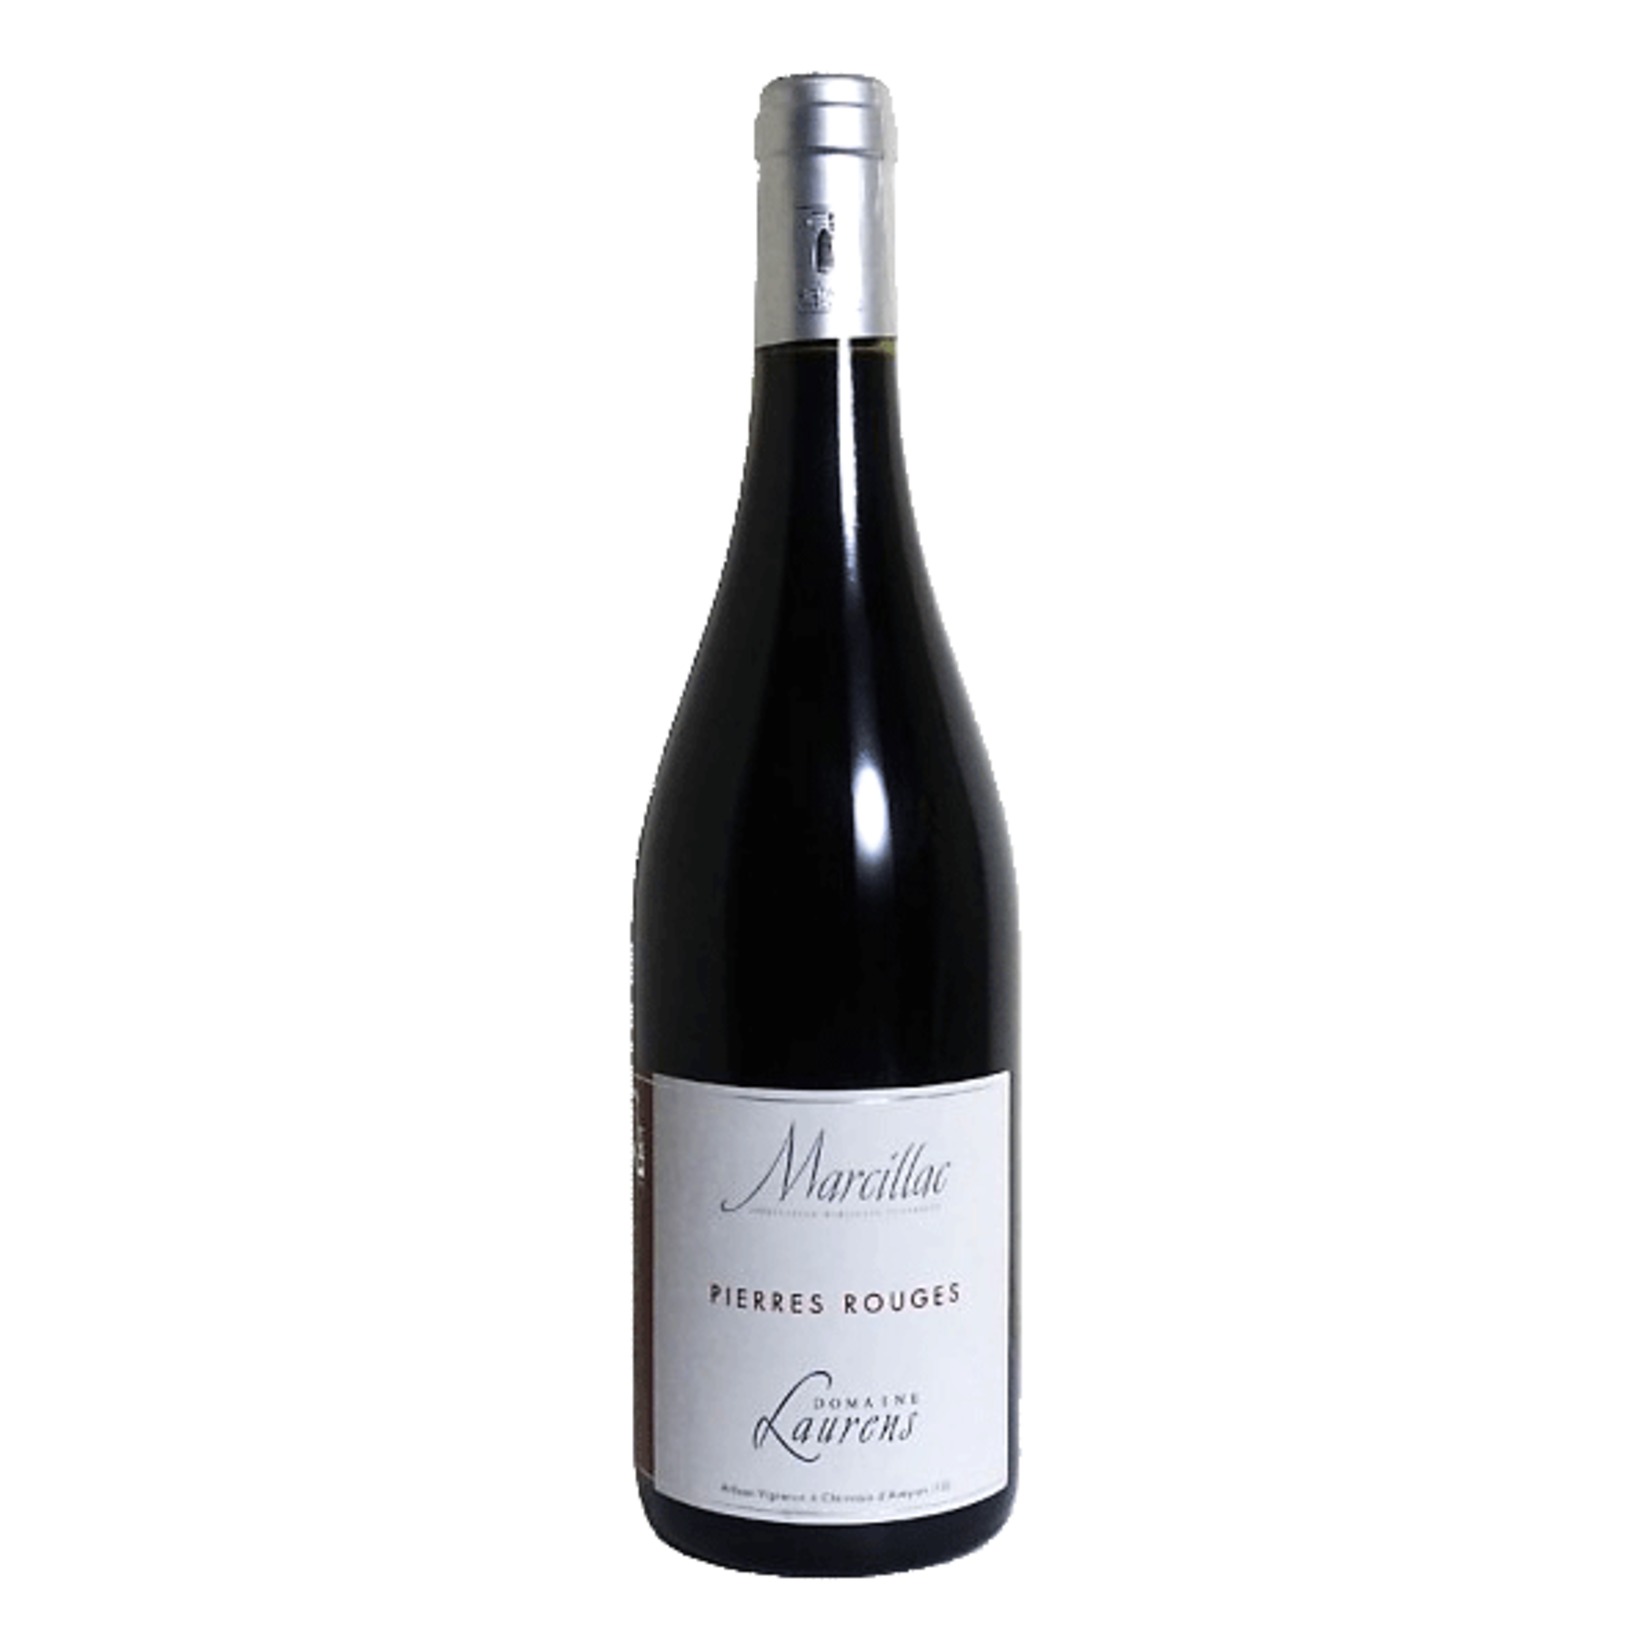 Wine Domaine Laurens Marcillac Pierres Rouges 2017